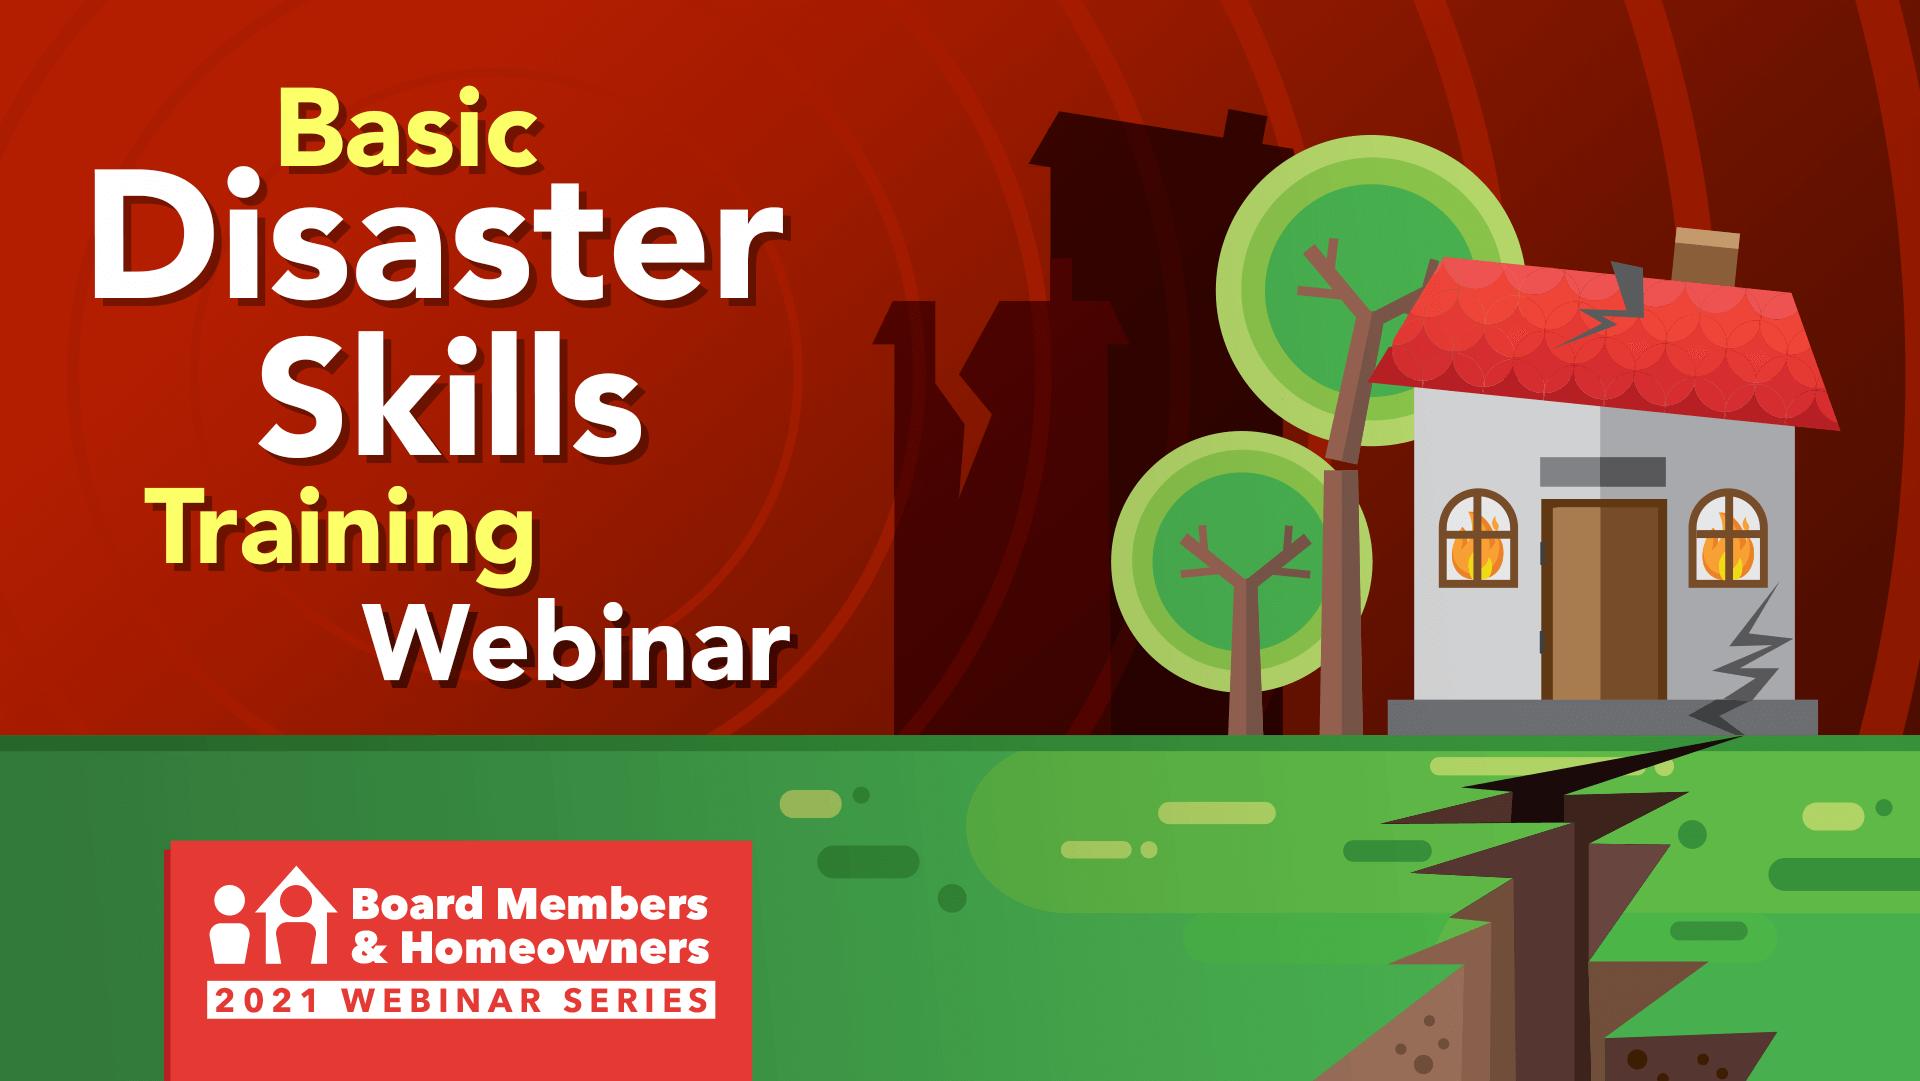 Basic Disaster Skills Training Webinar - October 14 - Board Members & Homeowners 2021 Webinar Series